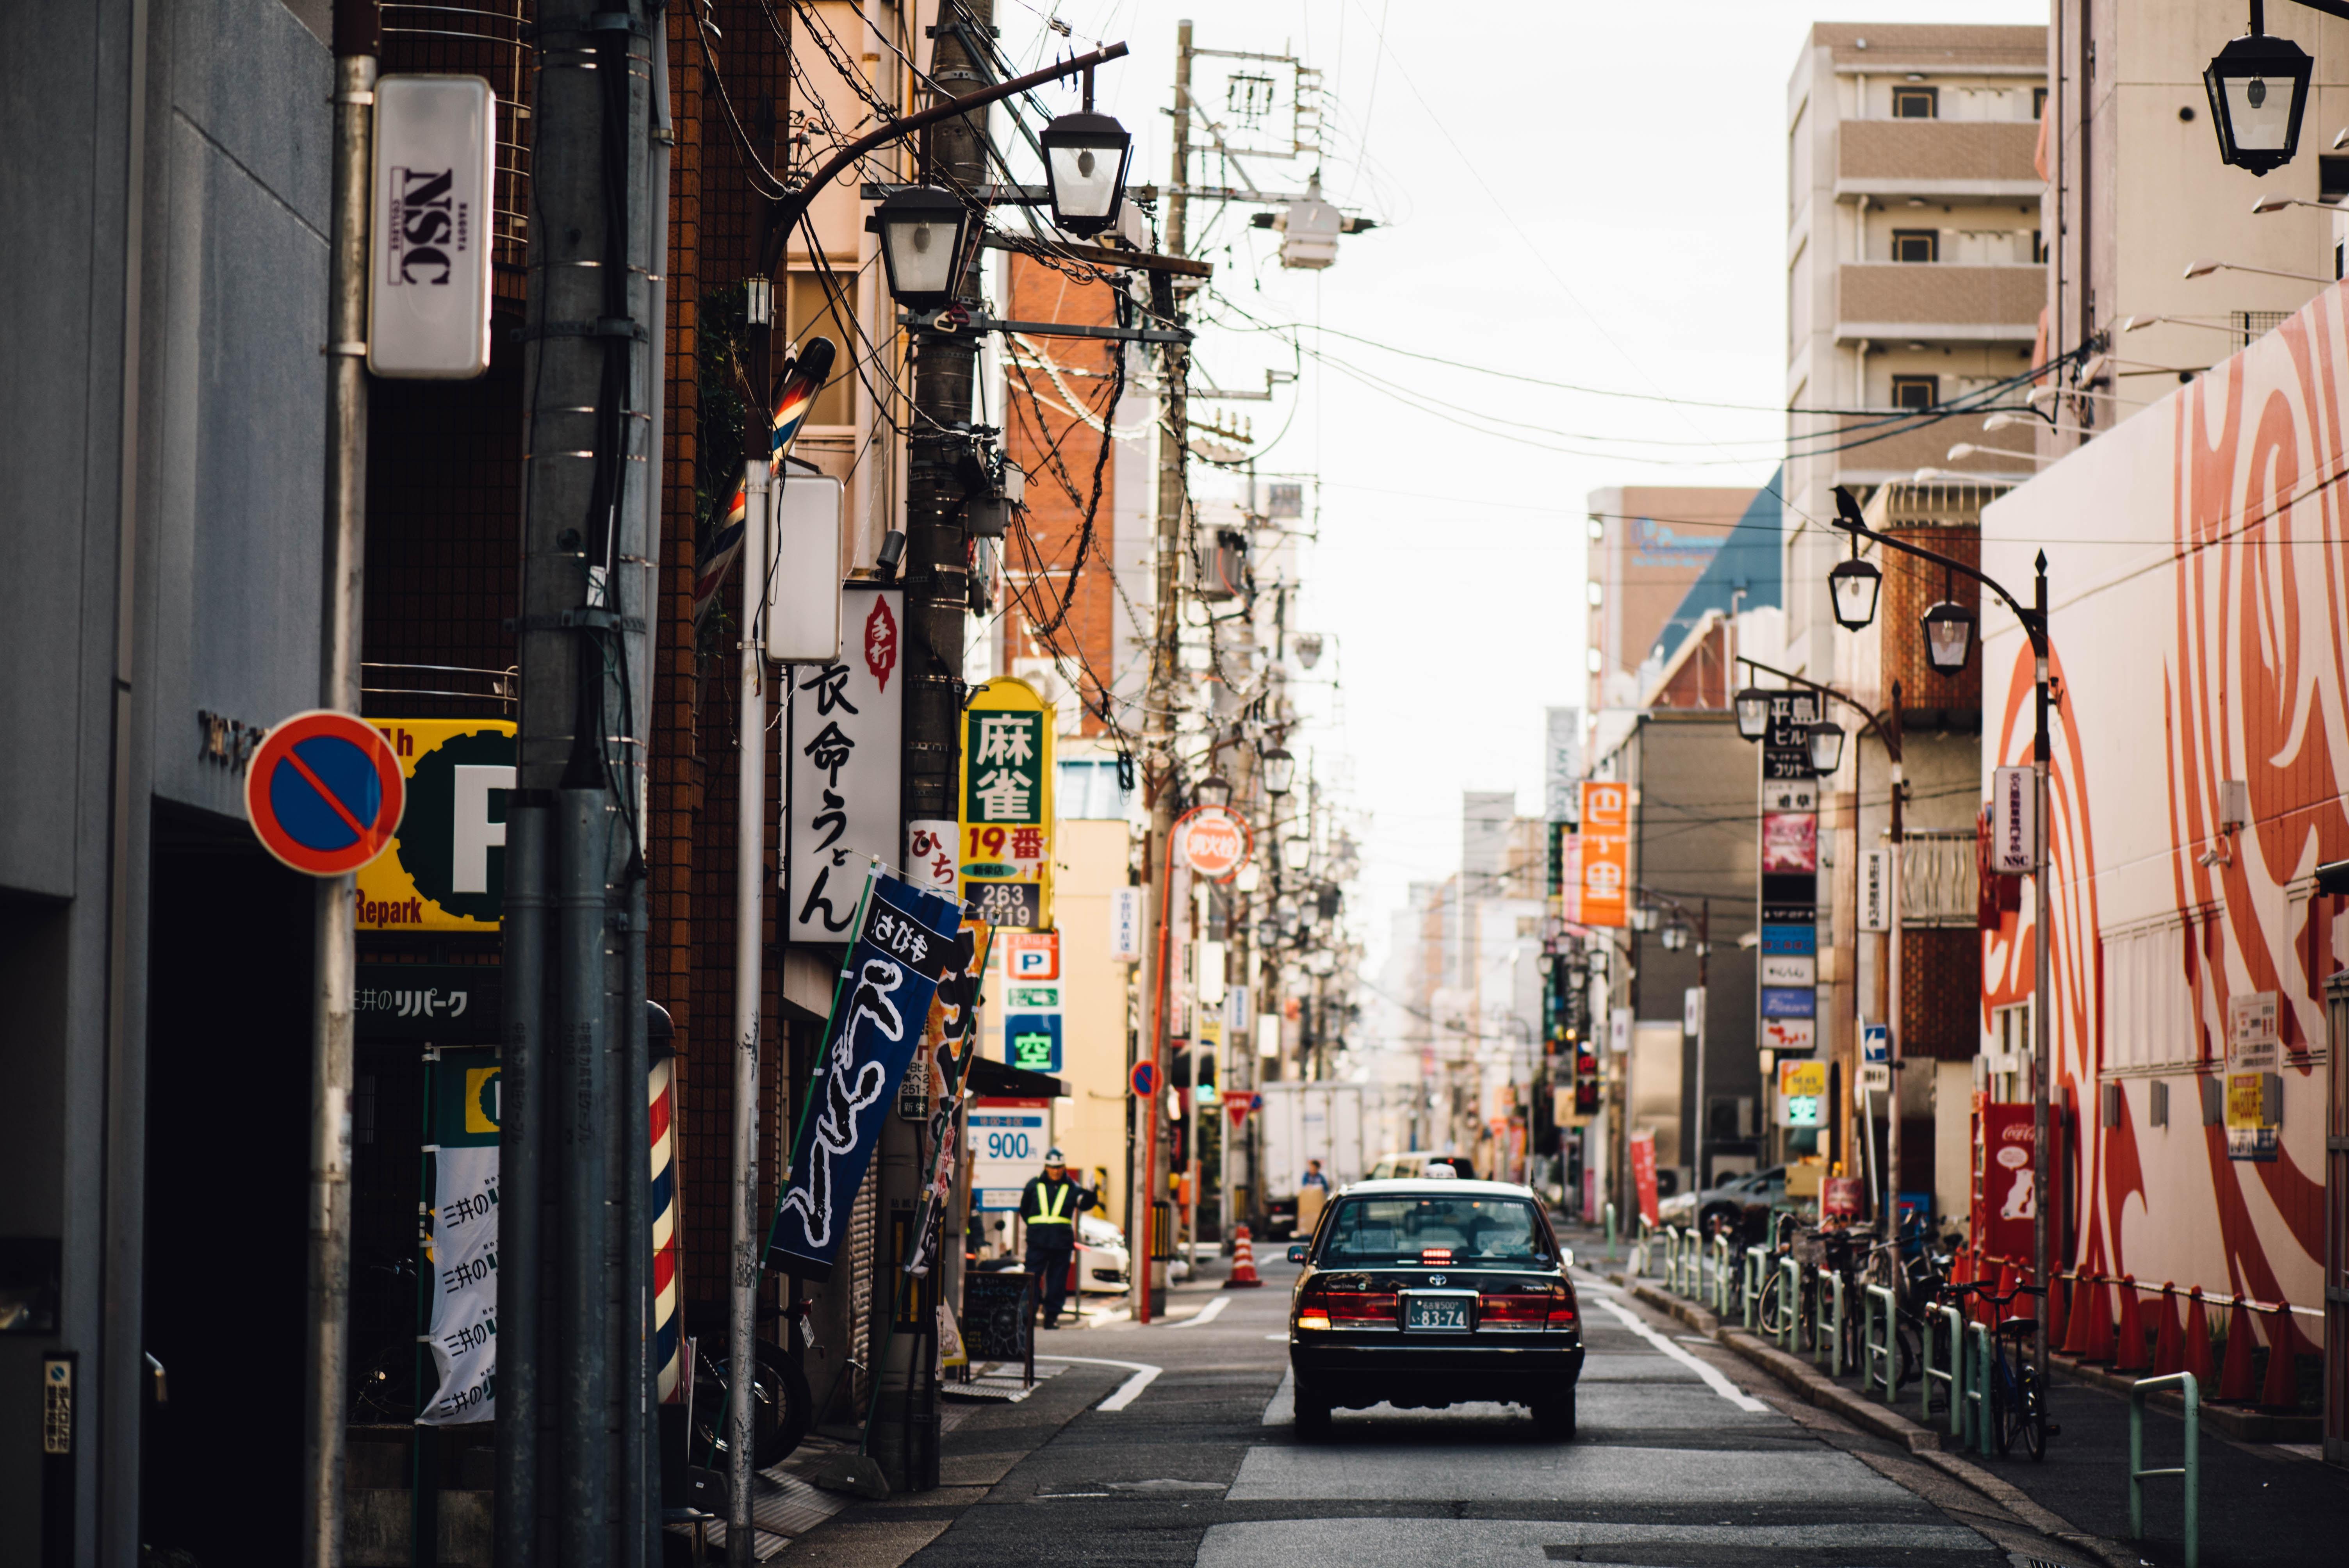 A car in a narrow street in an Asian city